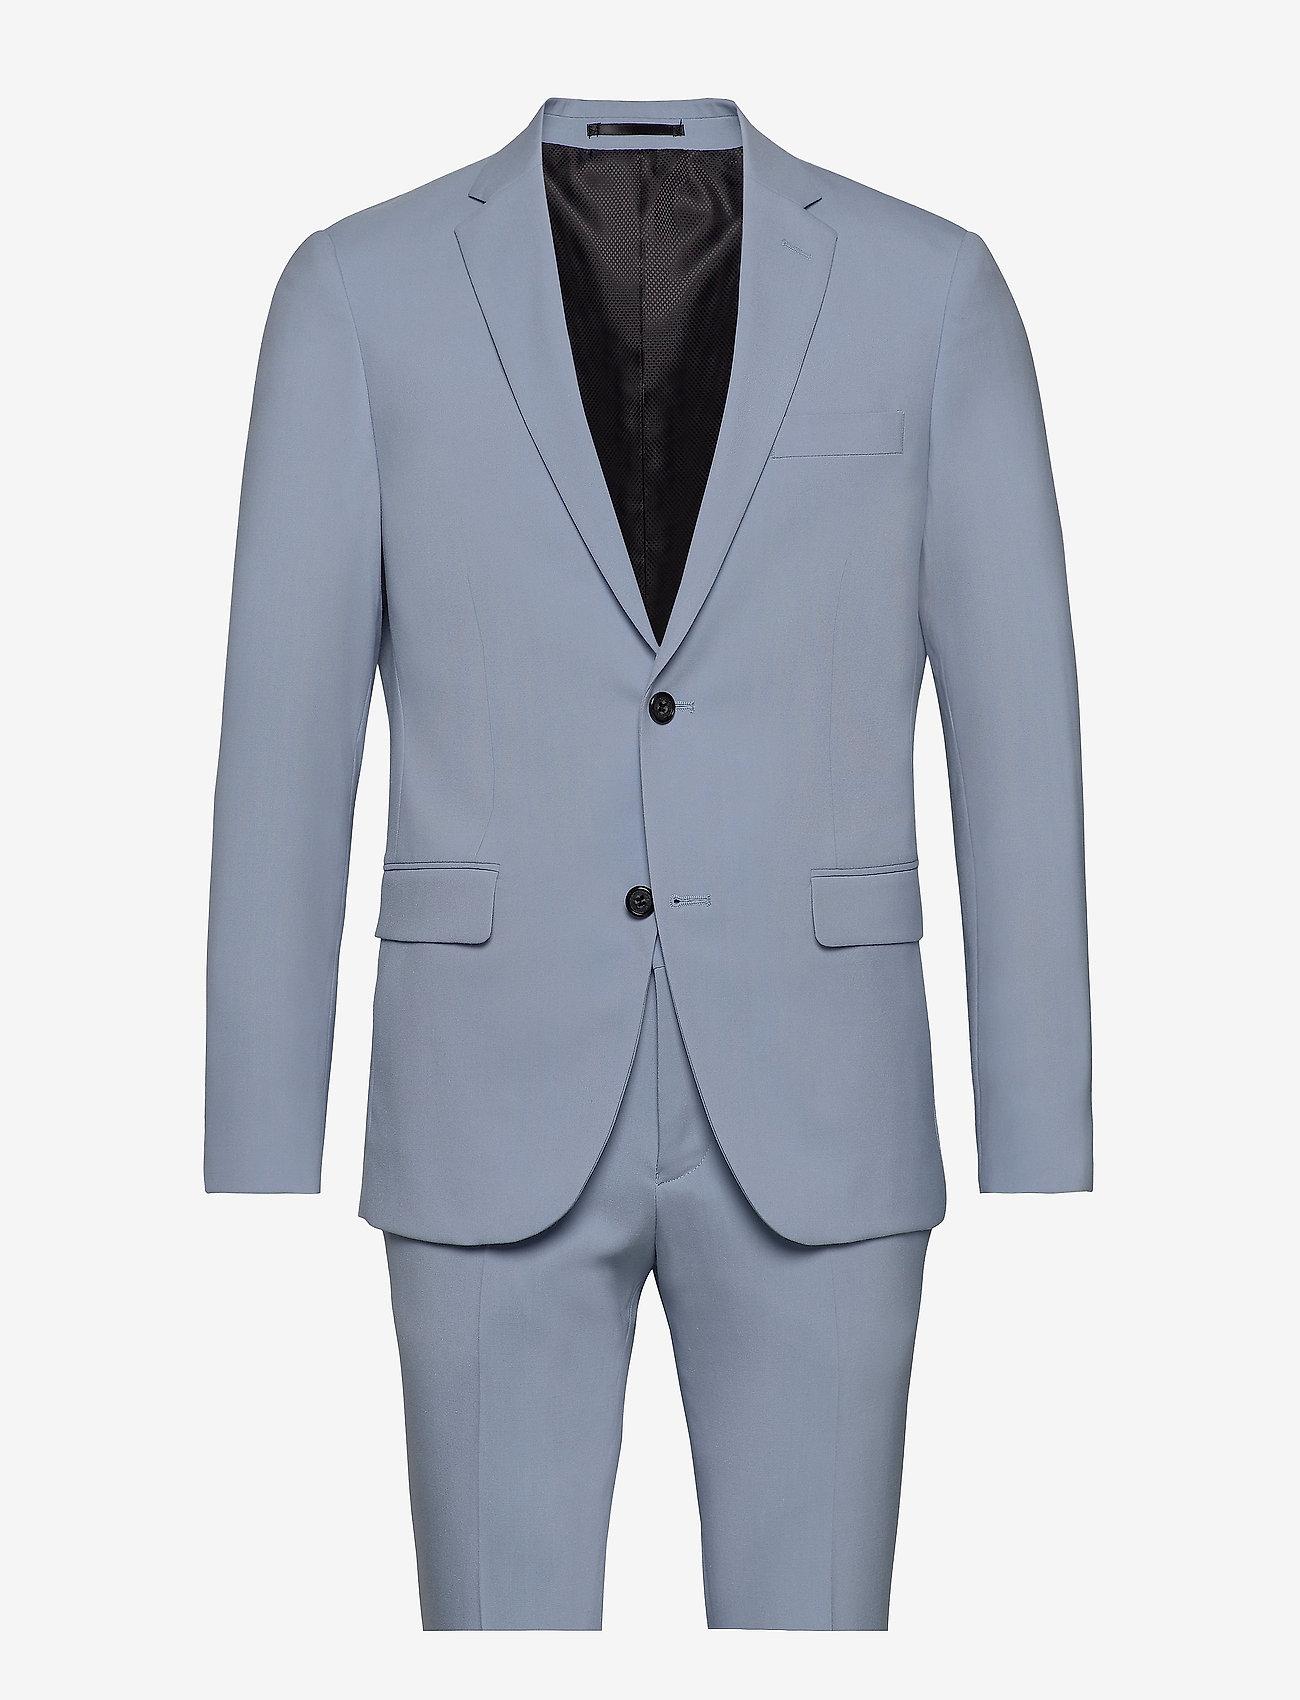 Lindbergh - Plain mens suit - yksiriviset puvut - lt blue - 0